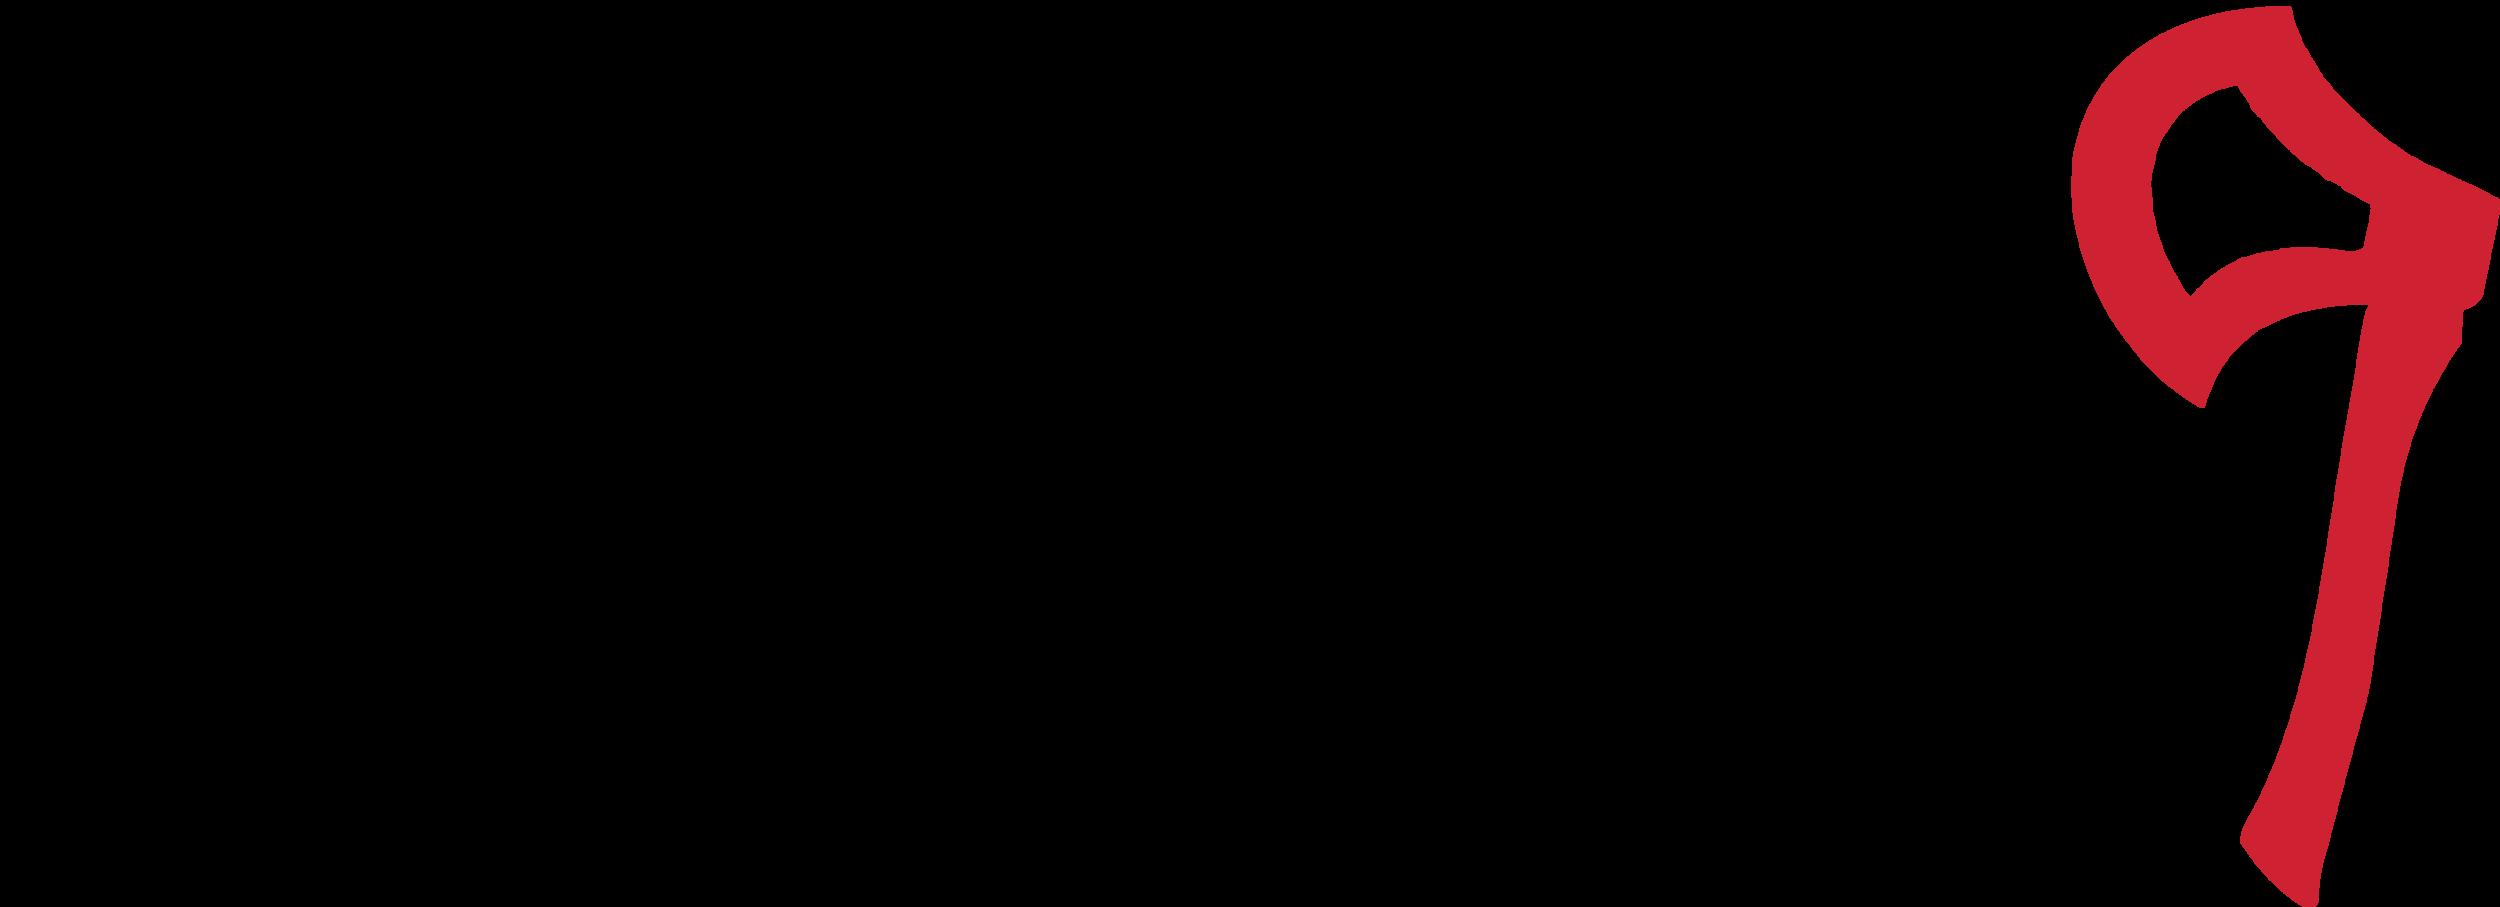 WiHM9-Black-vector.png